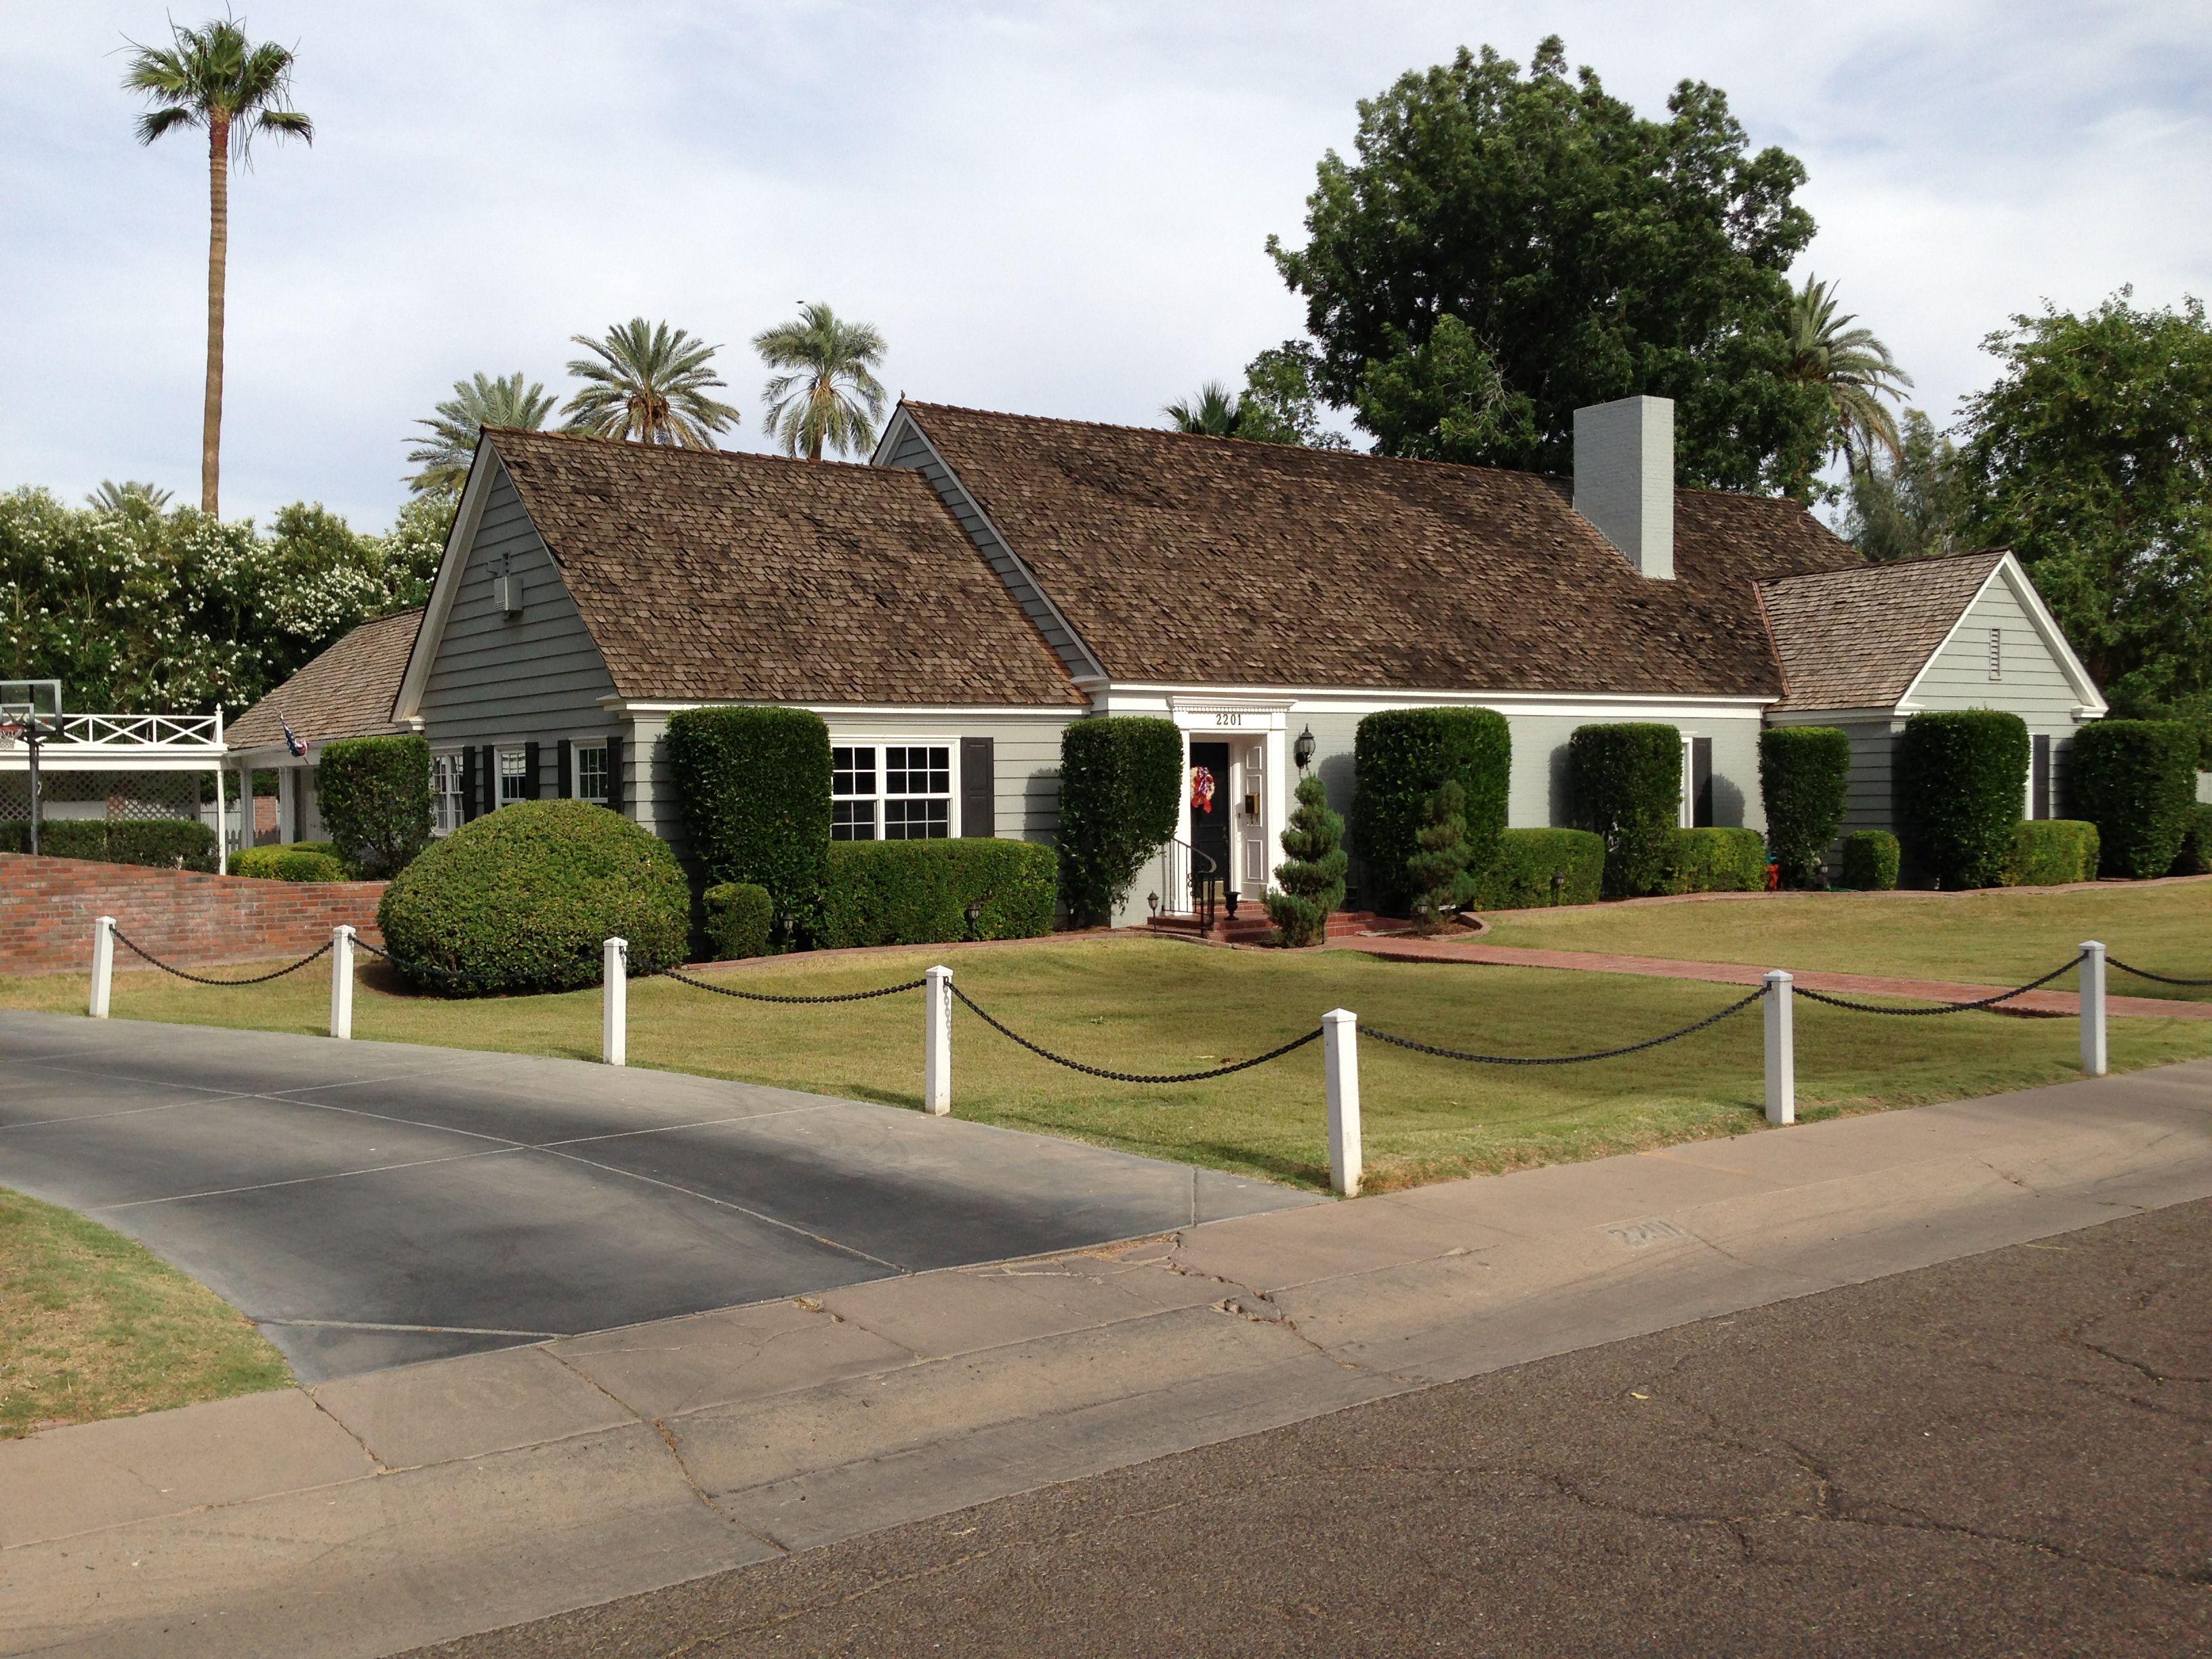 alvarado historic district homes for sale in phoenix arizona rh co pinterest com